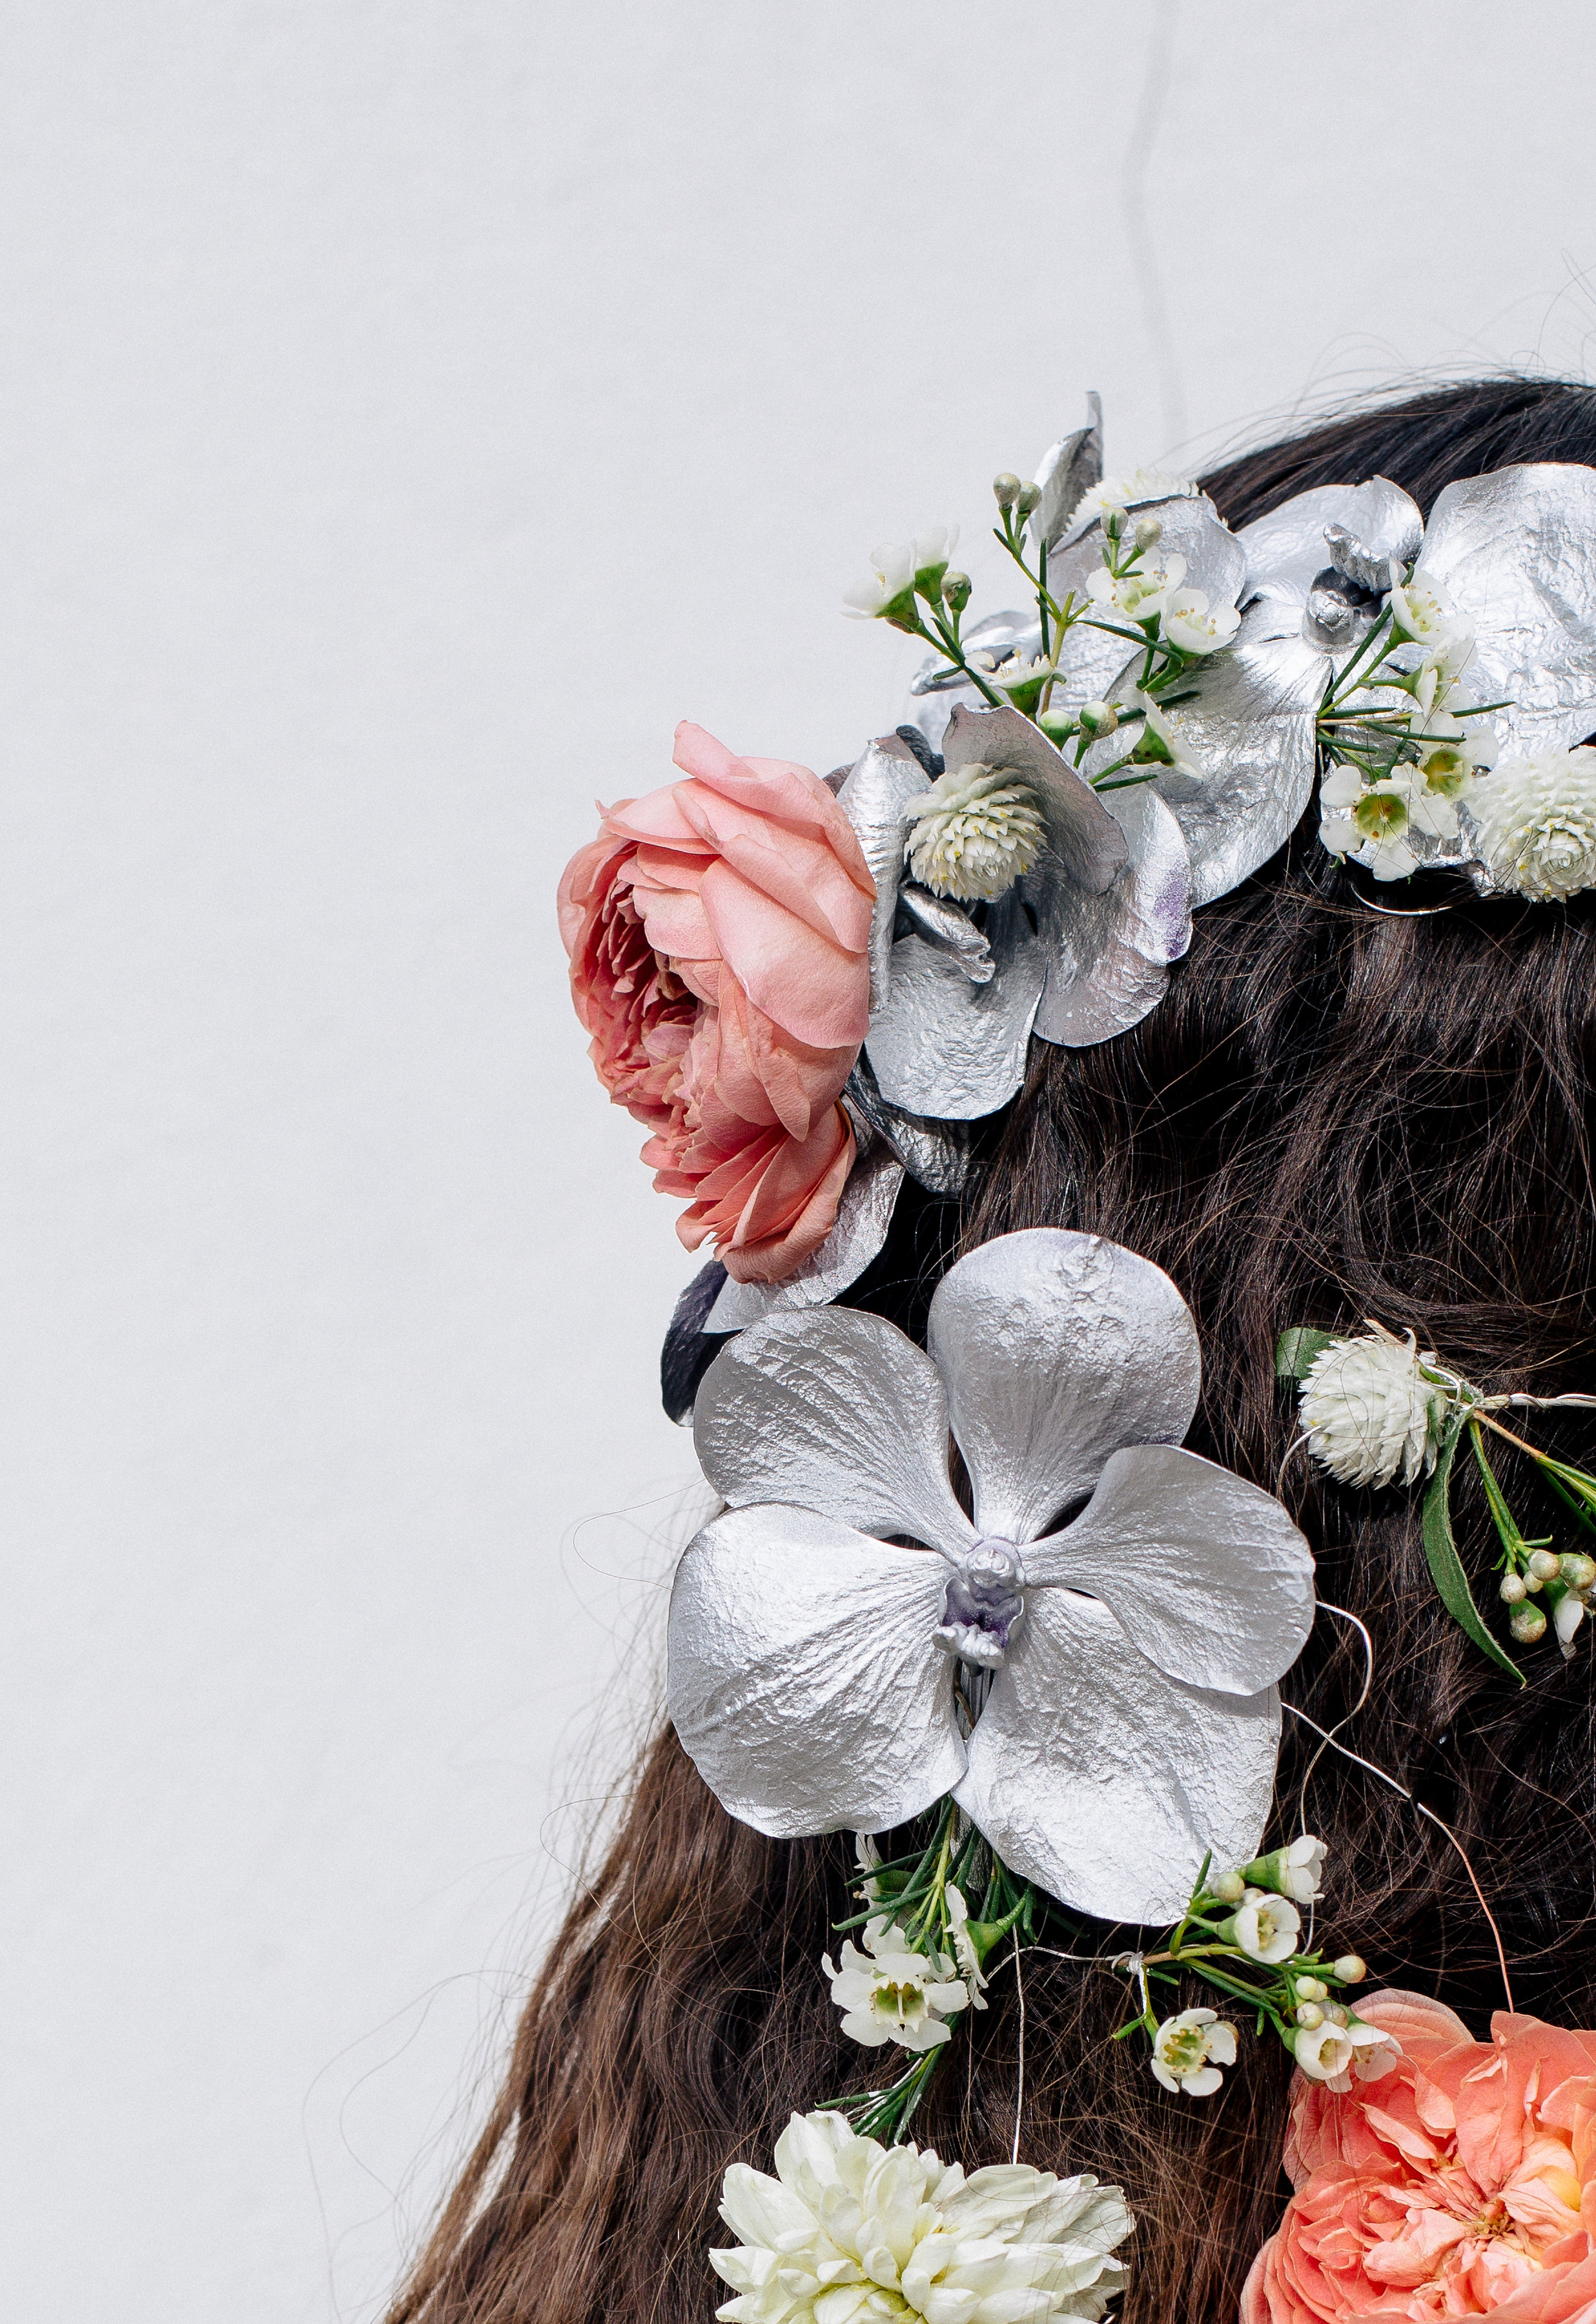 campagne ruban collectif 2018 coiffure eglantine reigniez piece florale lady brindille